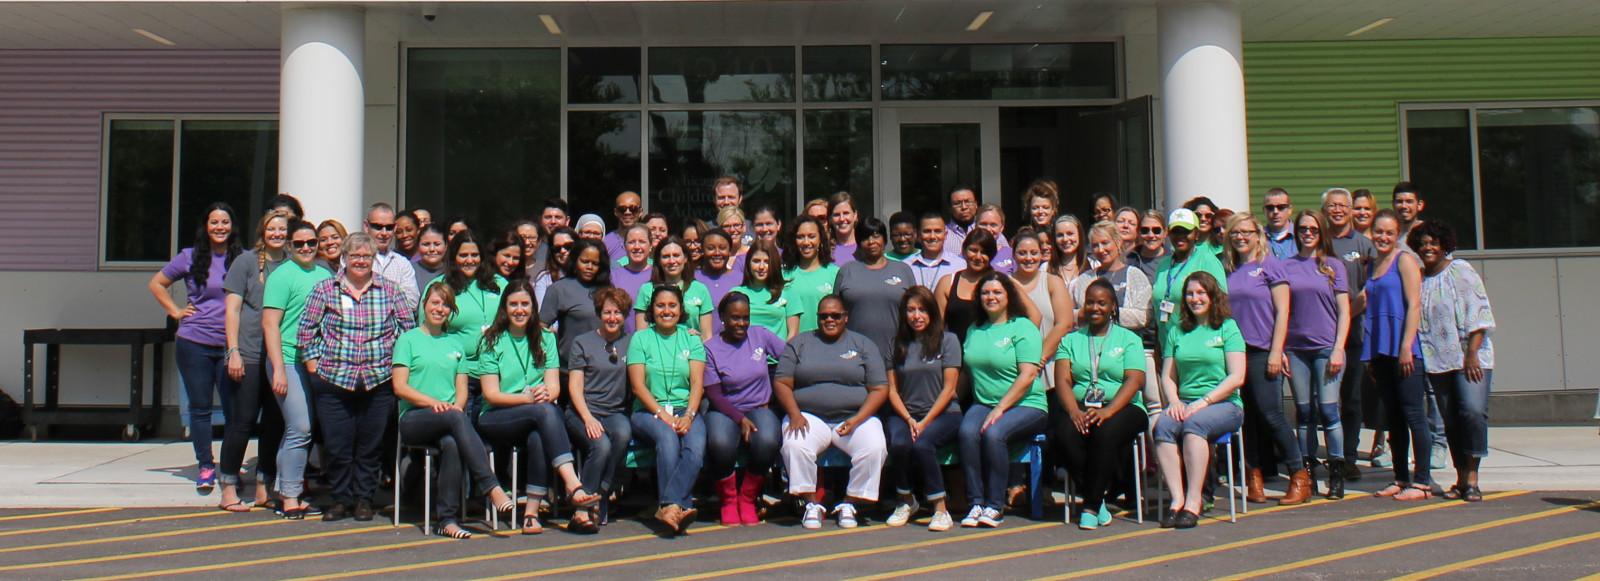 Children S Advocacy Center Chicago Building